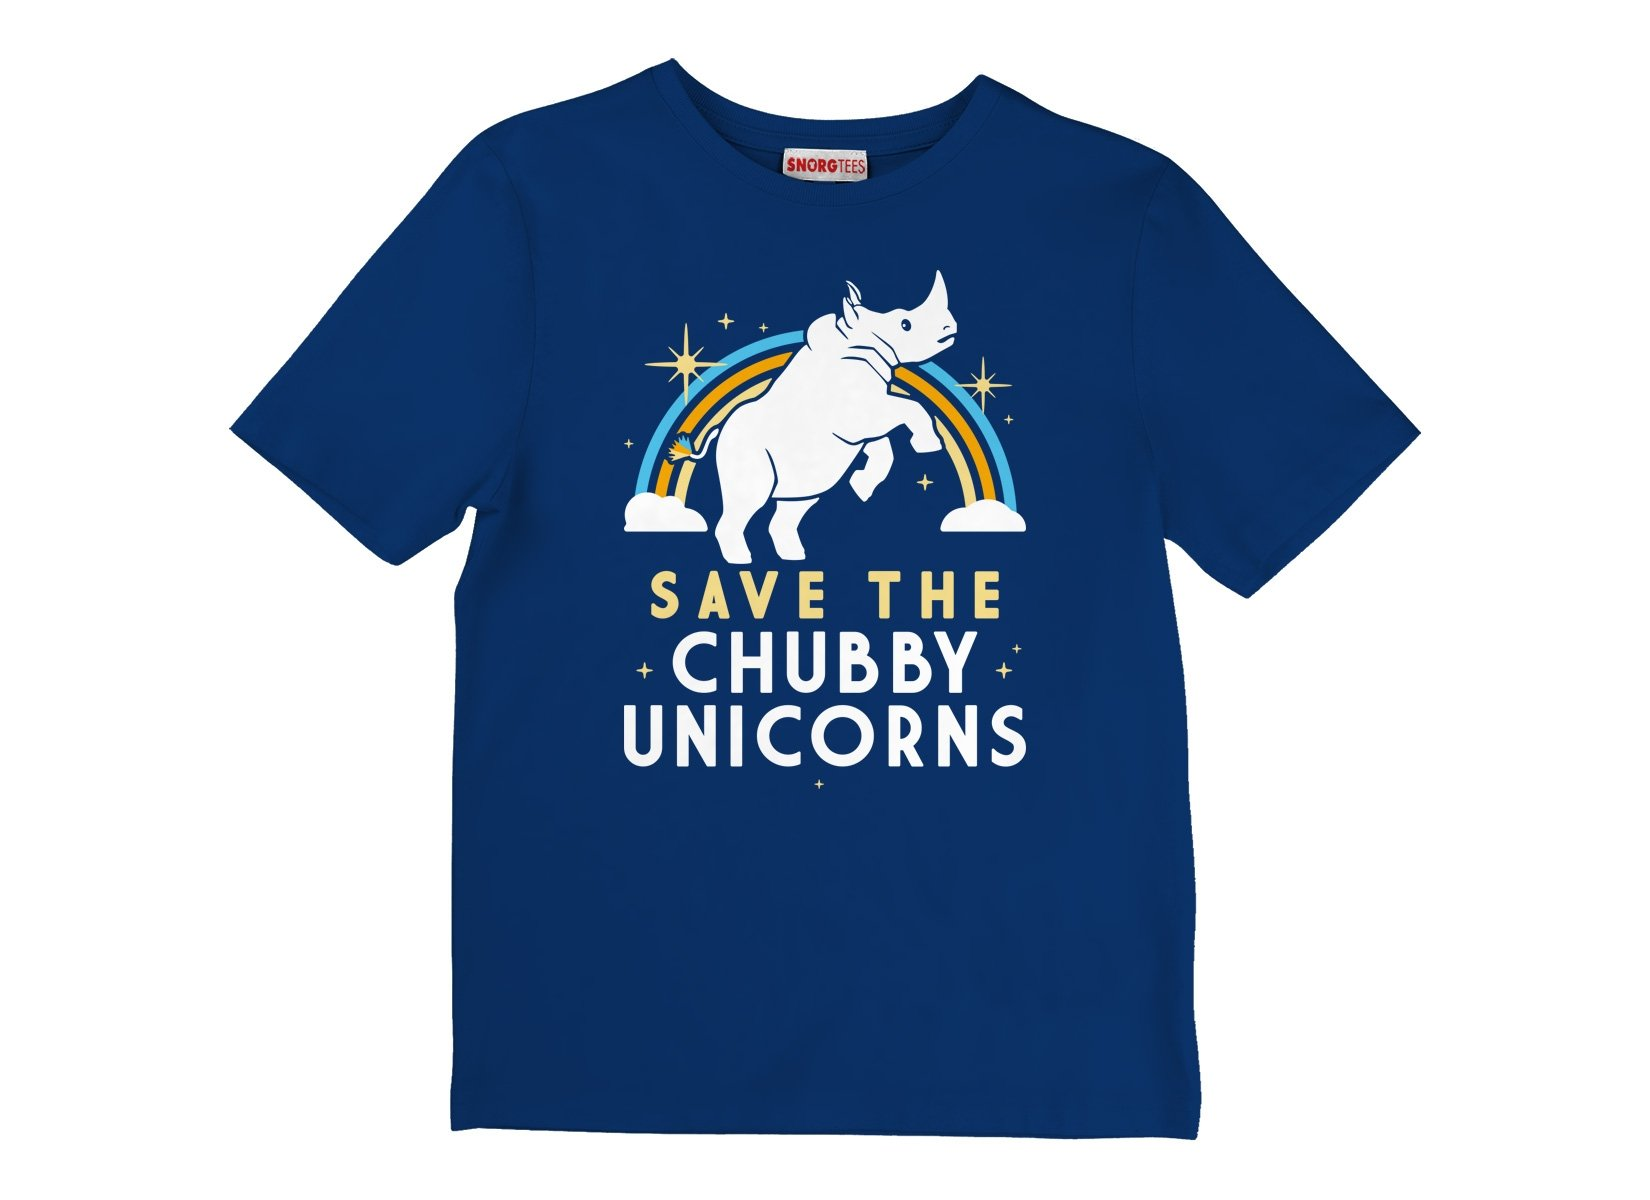 Save The Chubby Unicorns on Kids T-Shirt